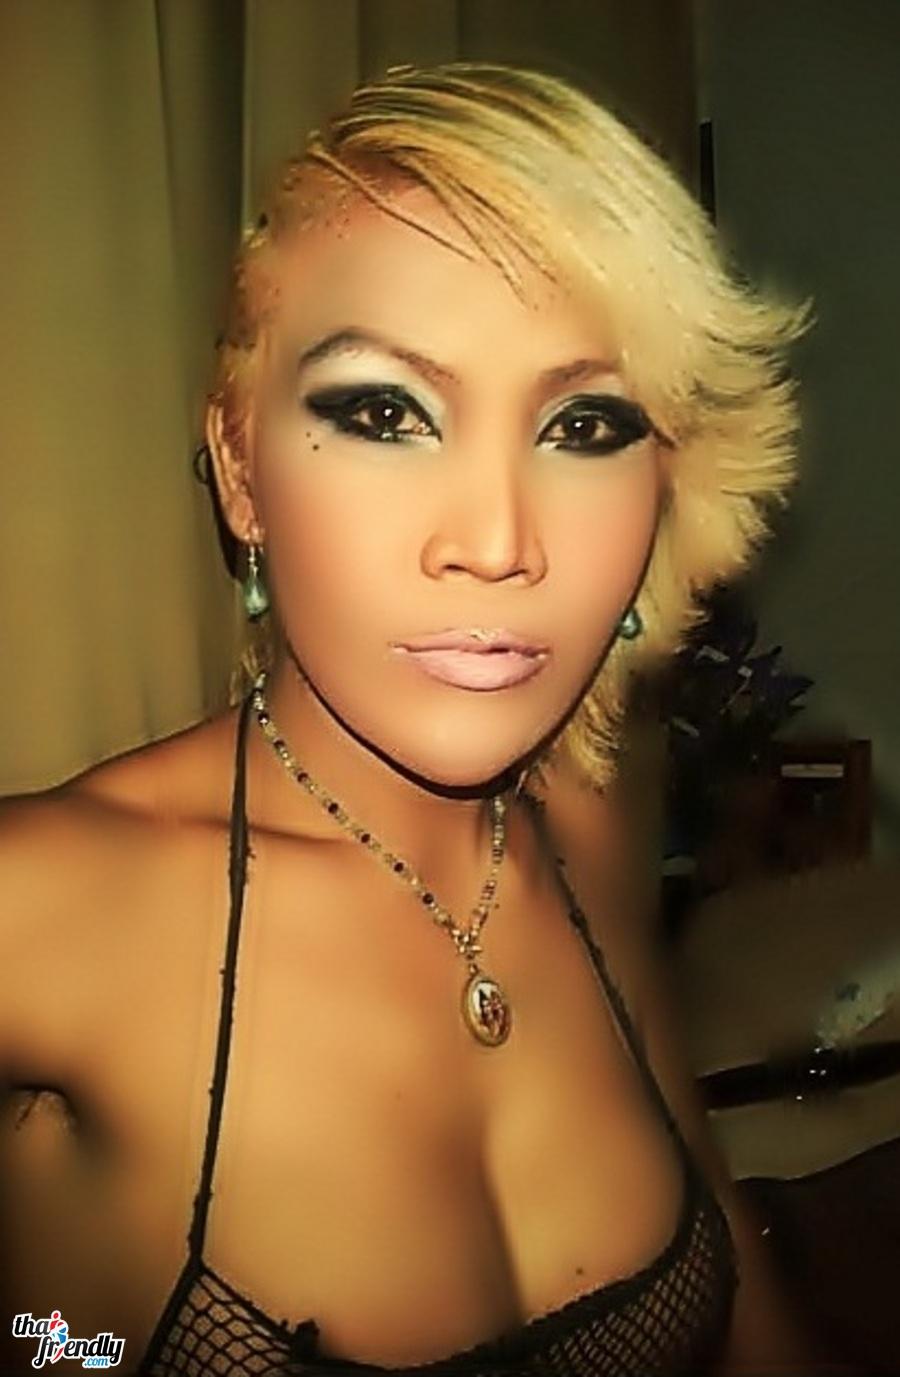 Ladyboy Bangkok